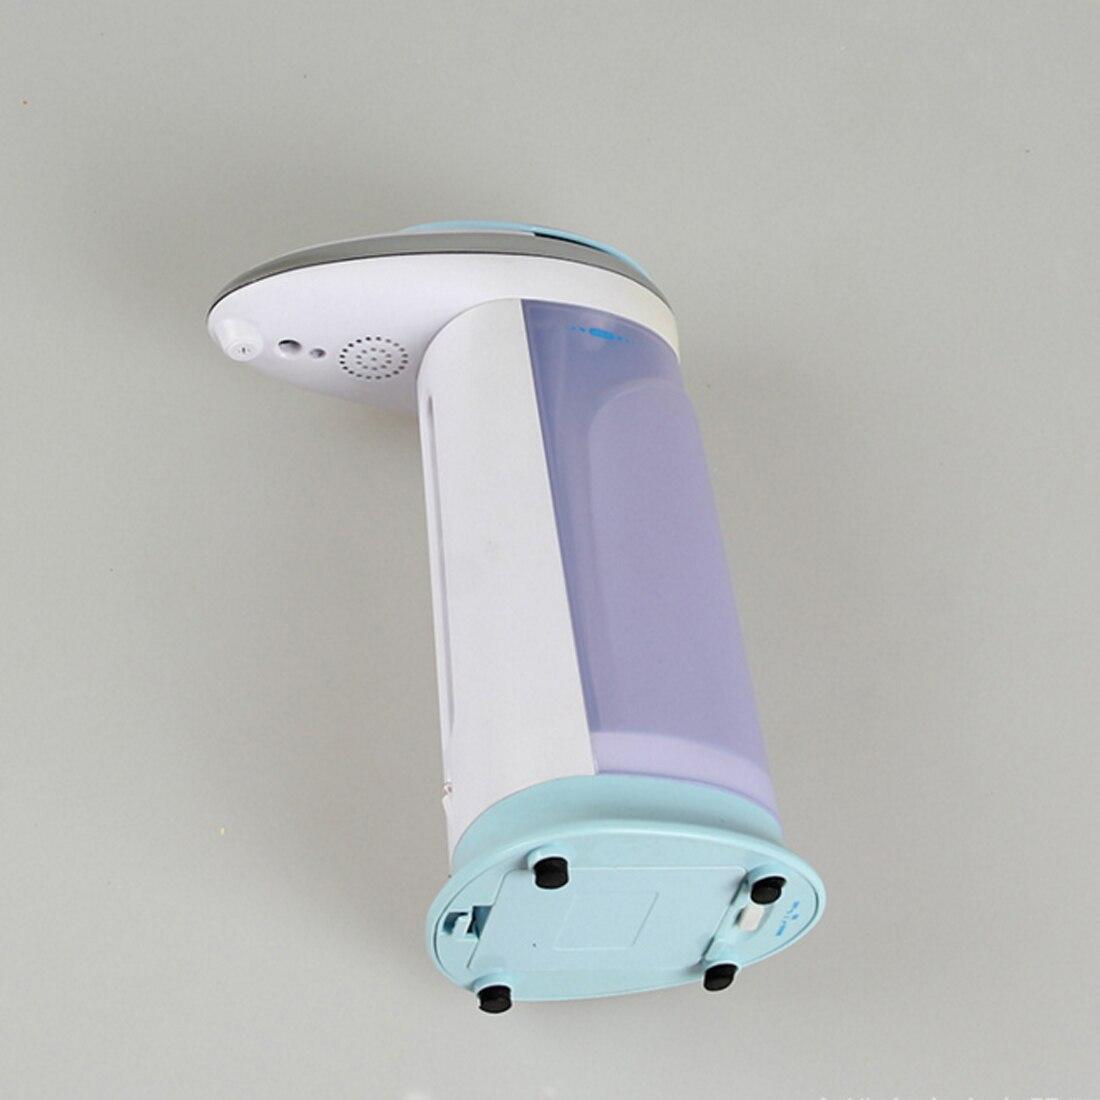 New Arrival 400Ml Electroplated Automatic Liquid Soap Dispenser Smart Sensor Touchless Sanitizer Dispensador Kitchen Bathroom